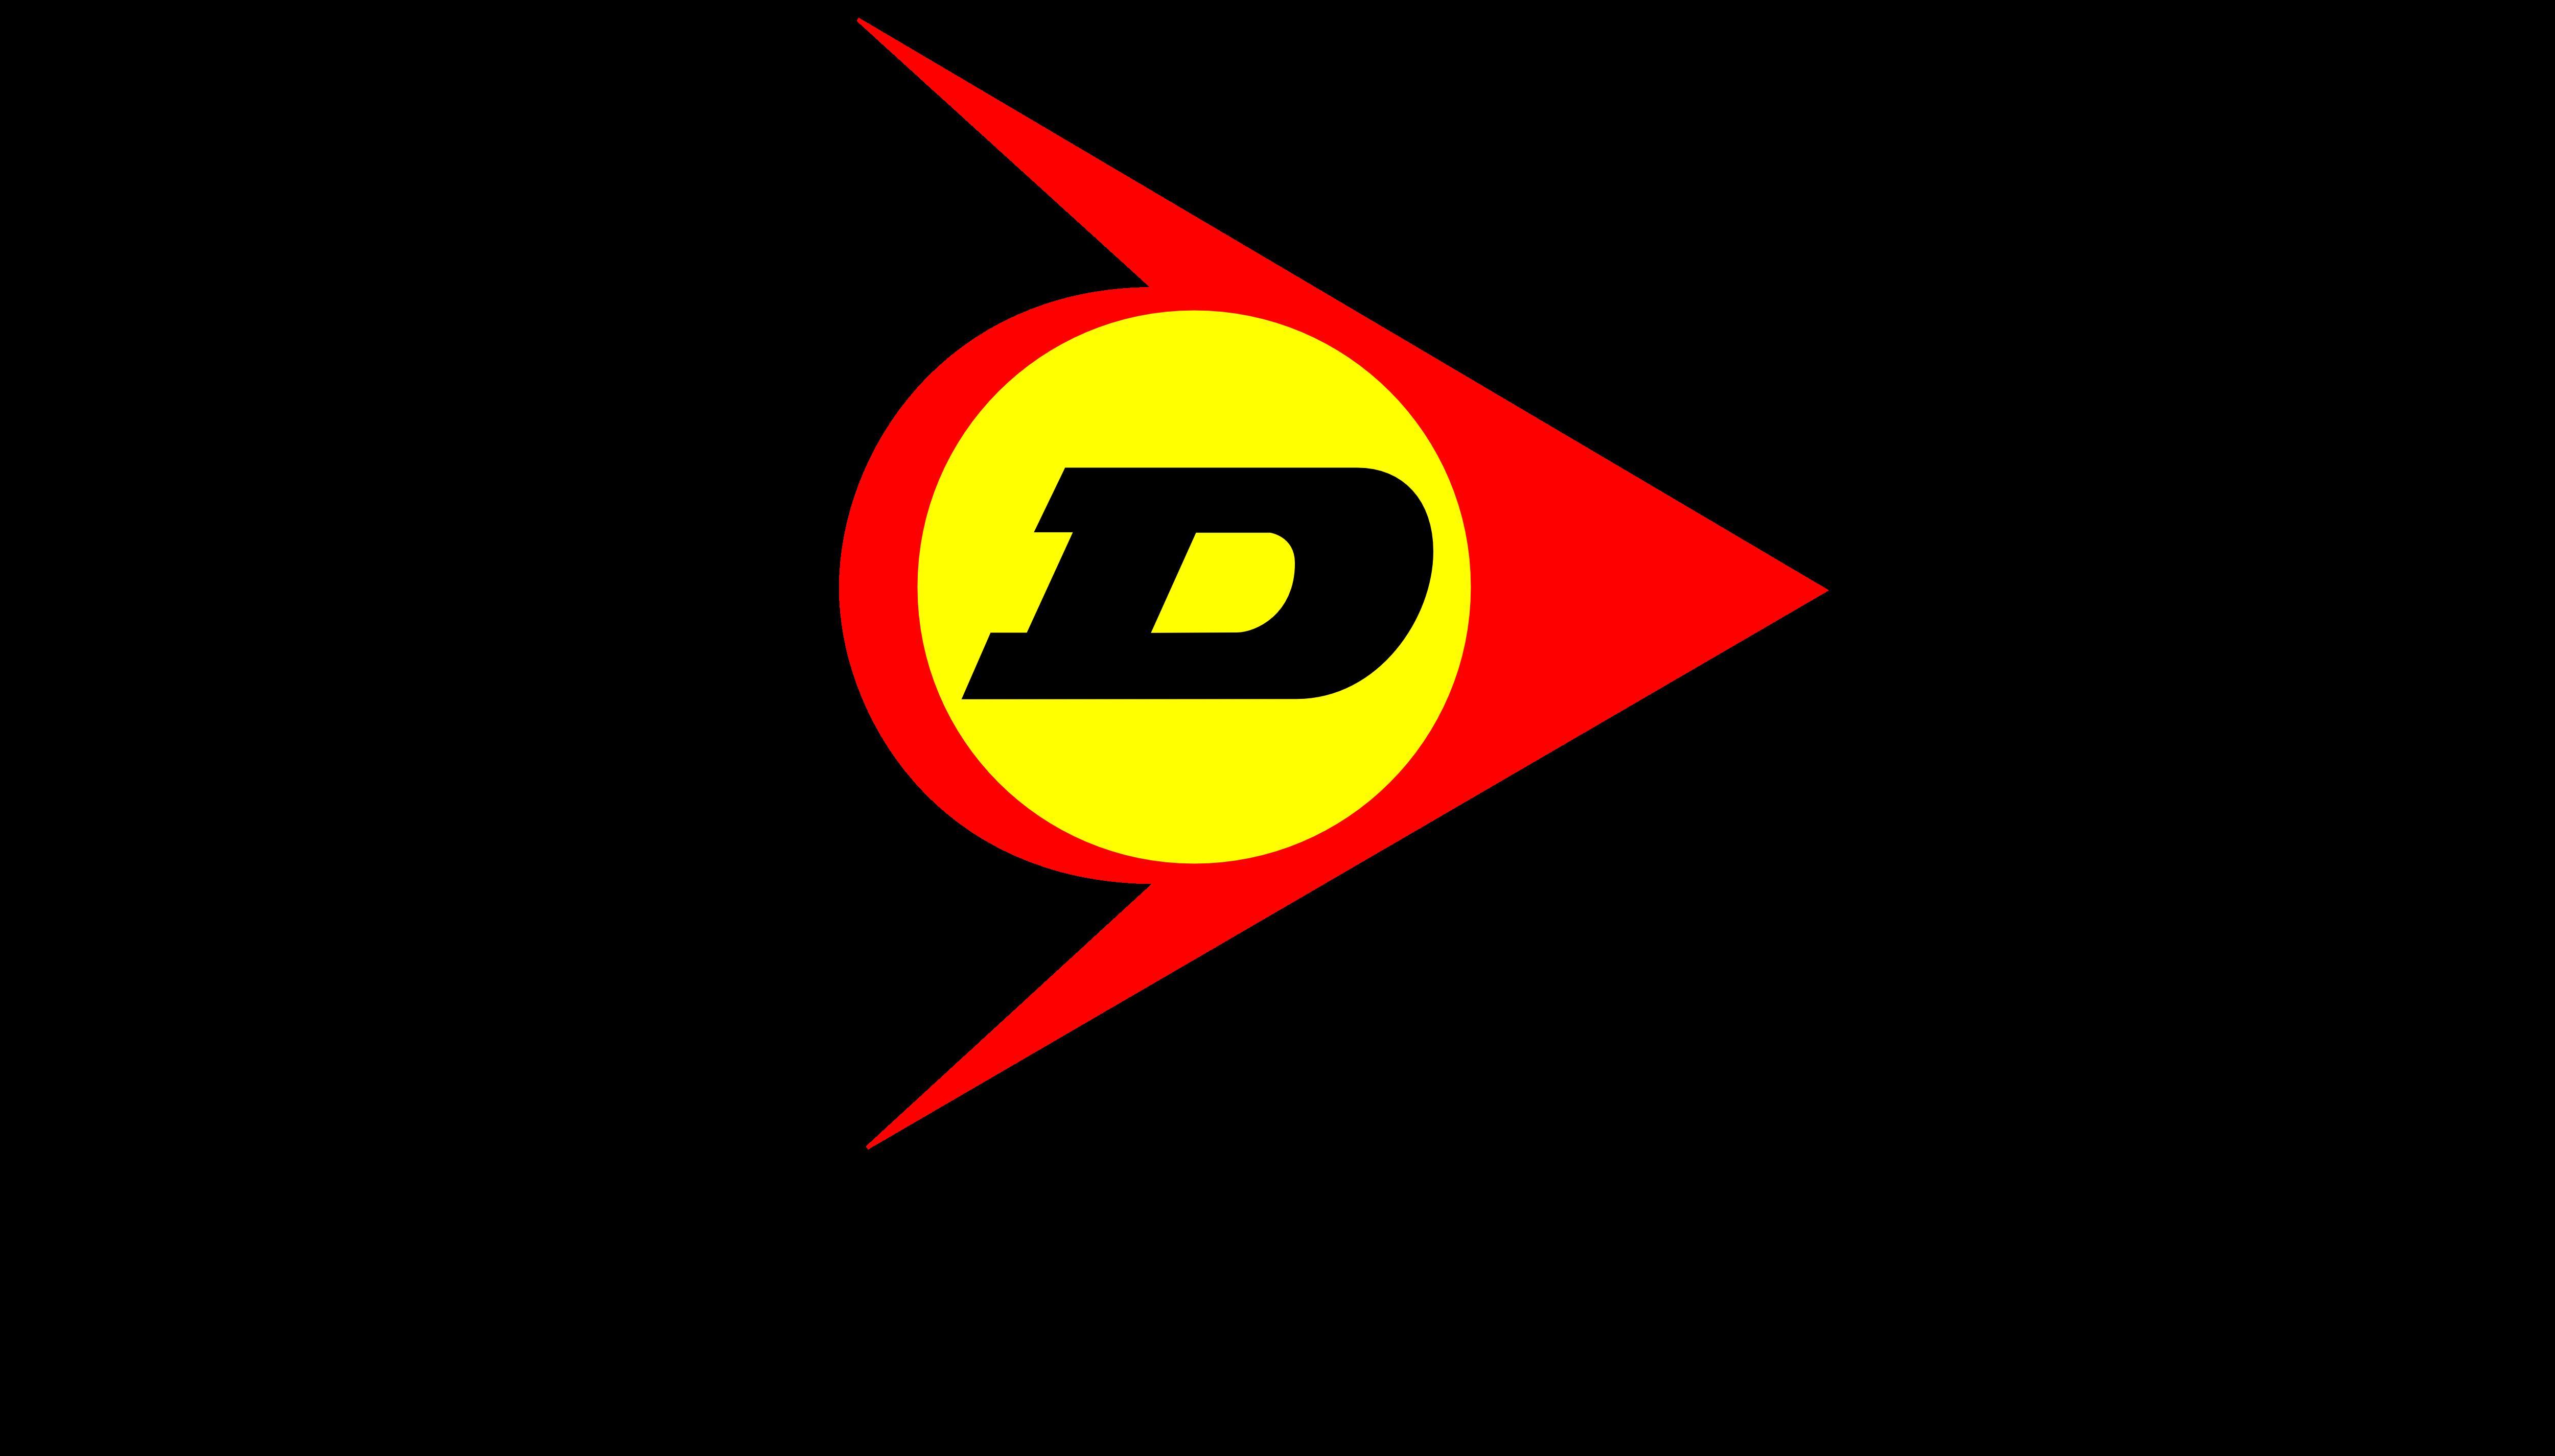 dunlop logos download manchester united logo font manchester united logo images